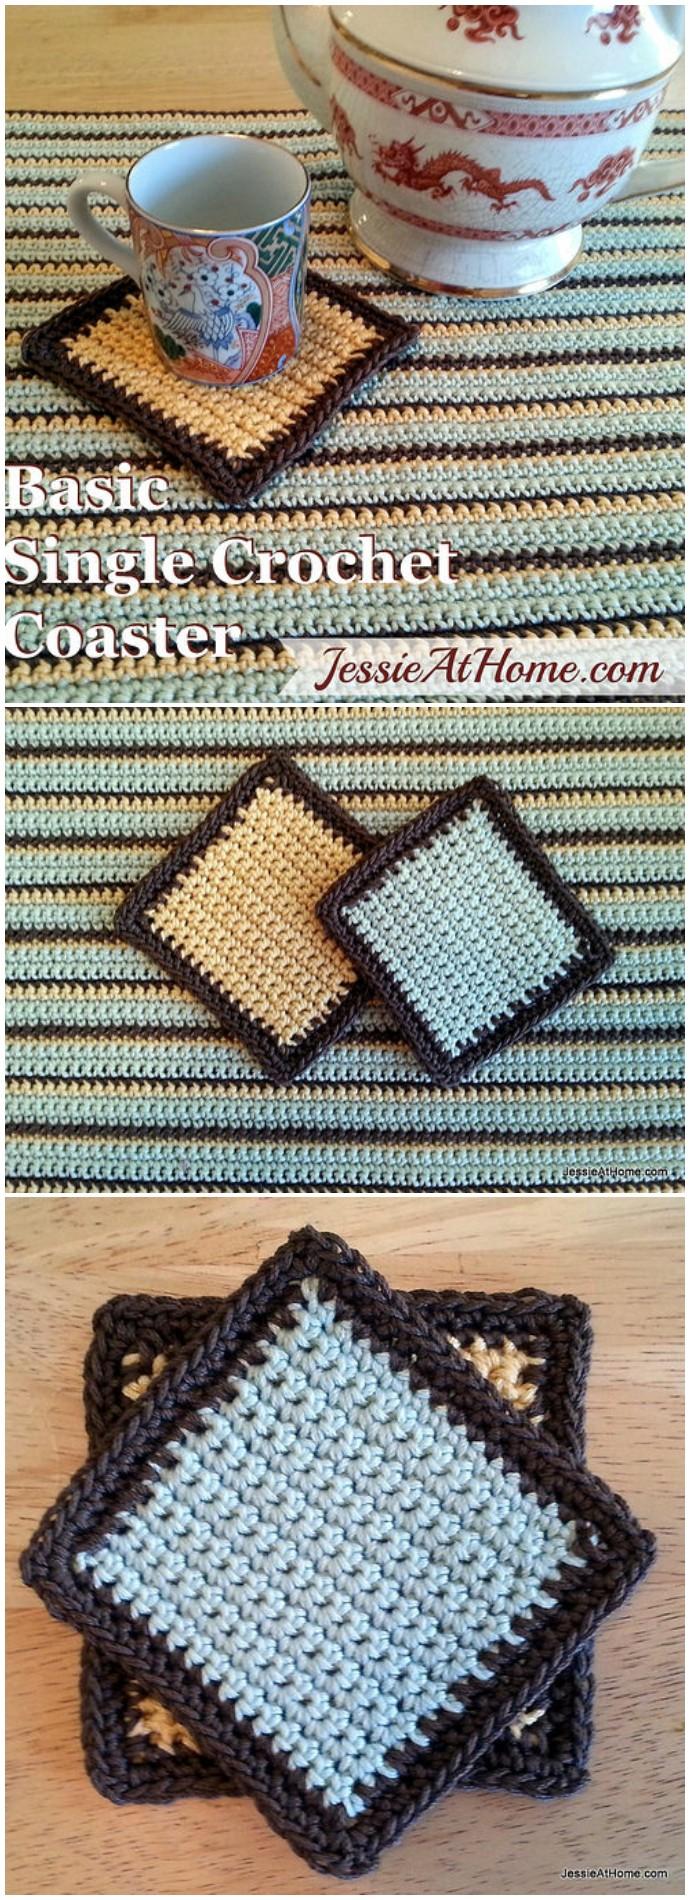 Basic Single Free Crochet Coaster